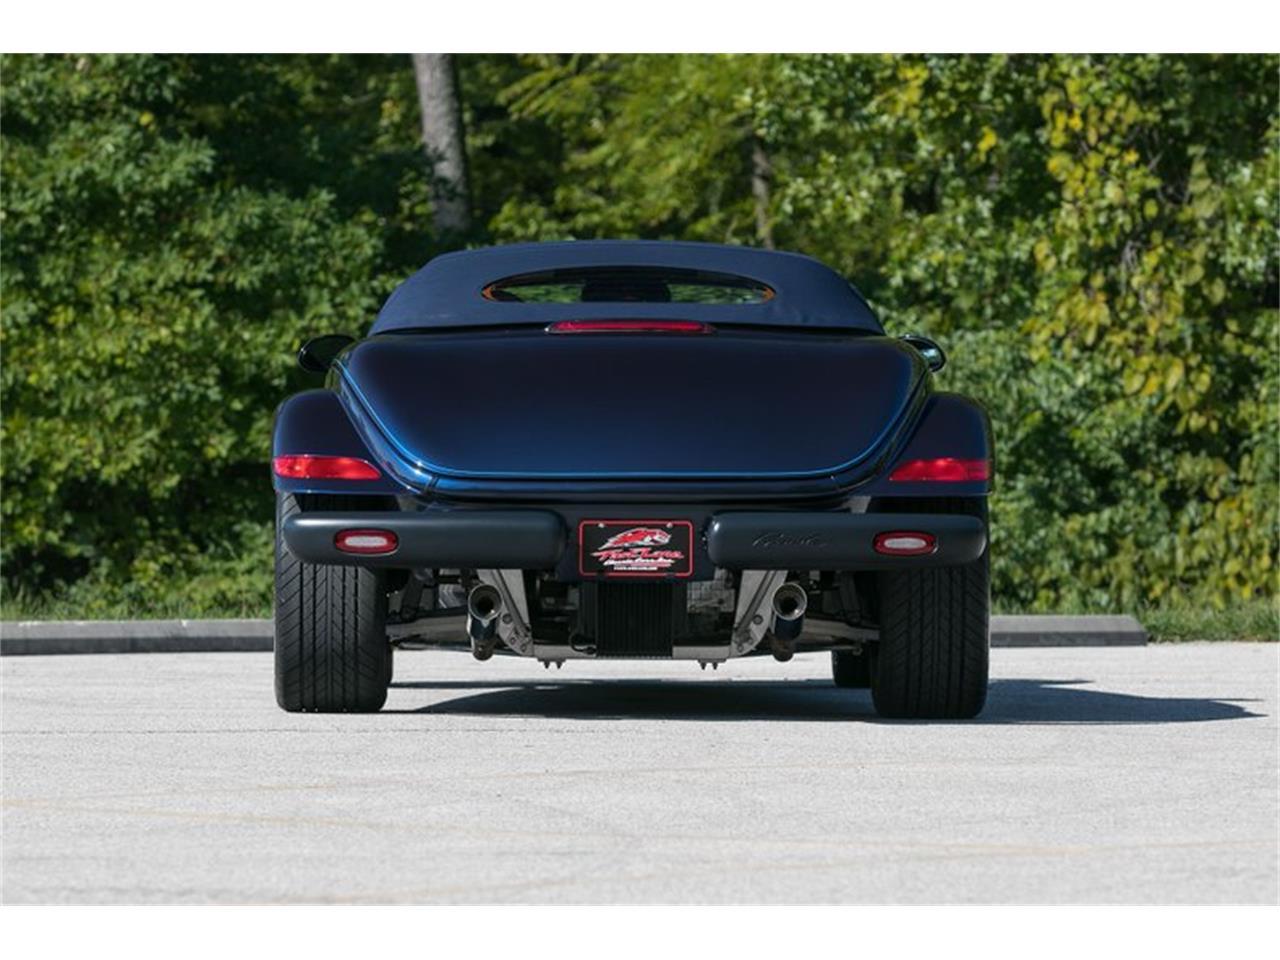 2001 Chrysler Prowler (CC-1392400) for sale in St. Charles, Missouri